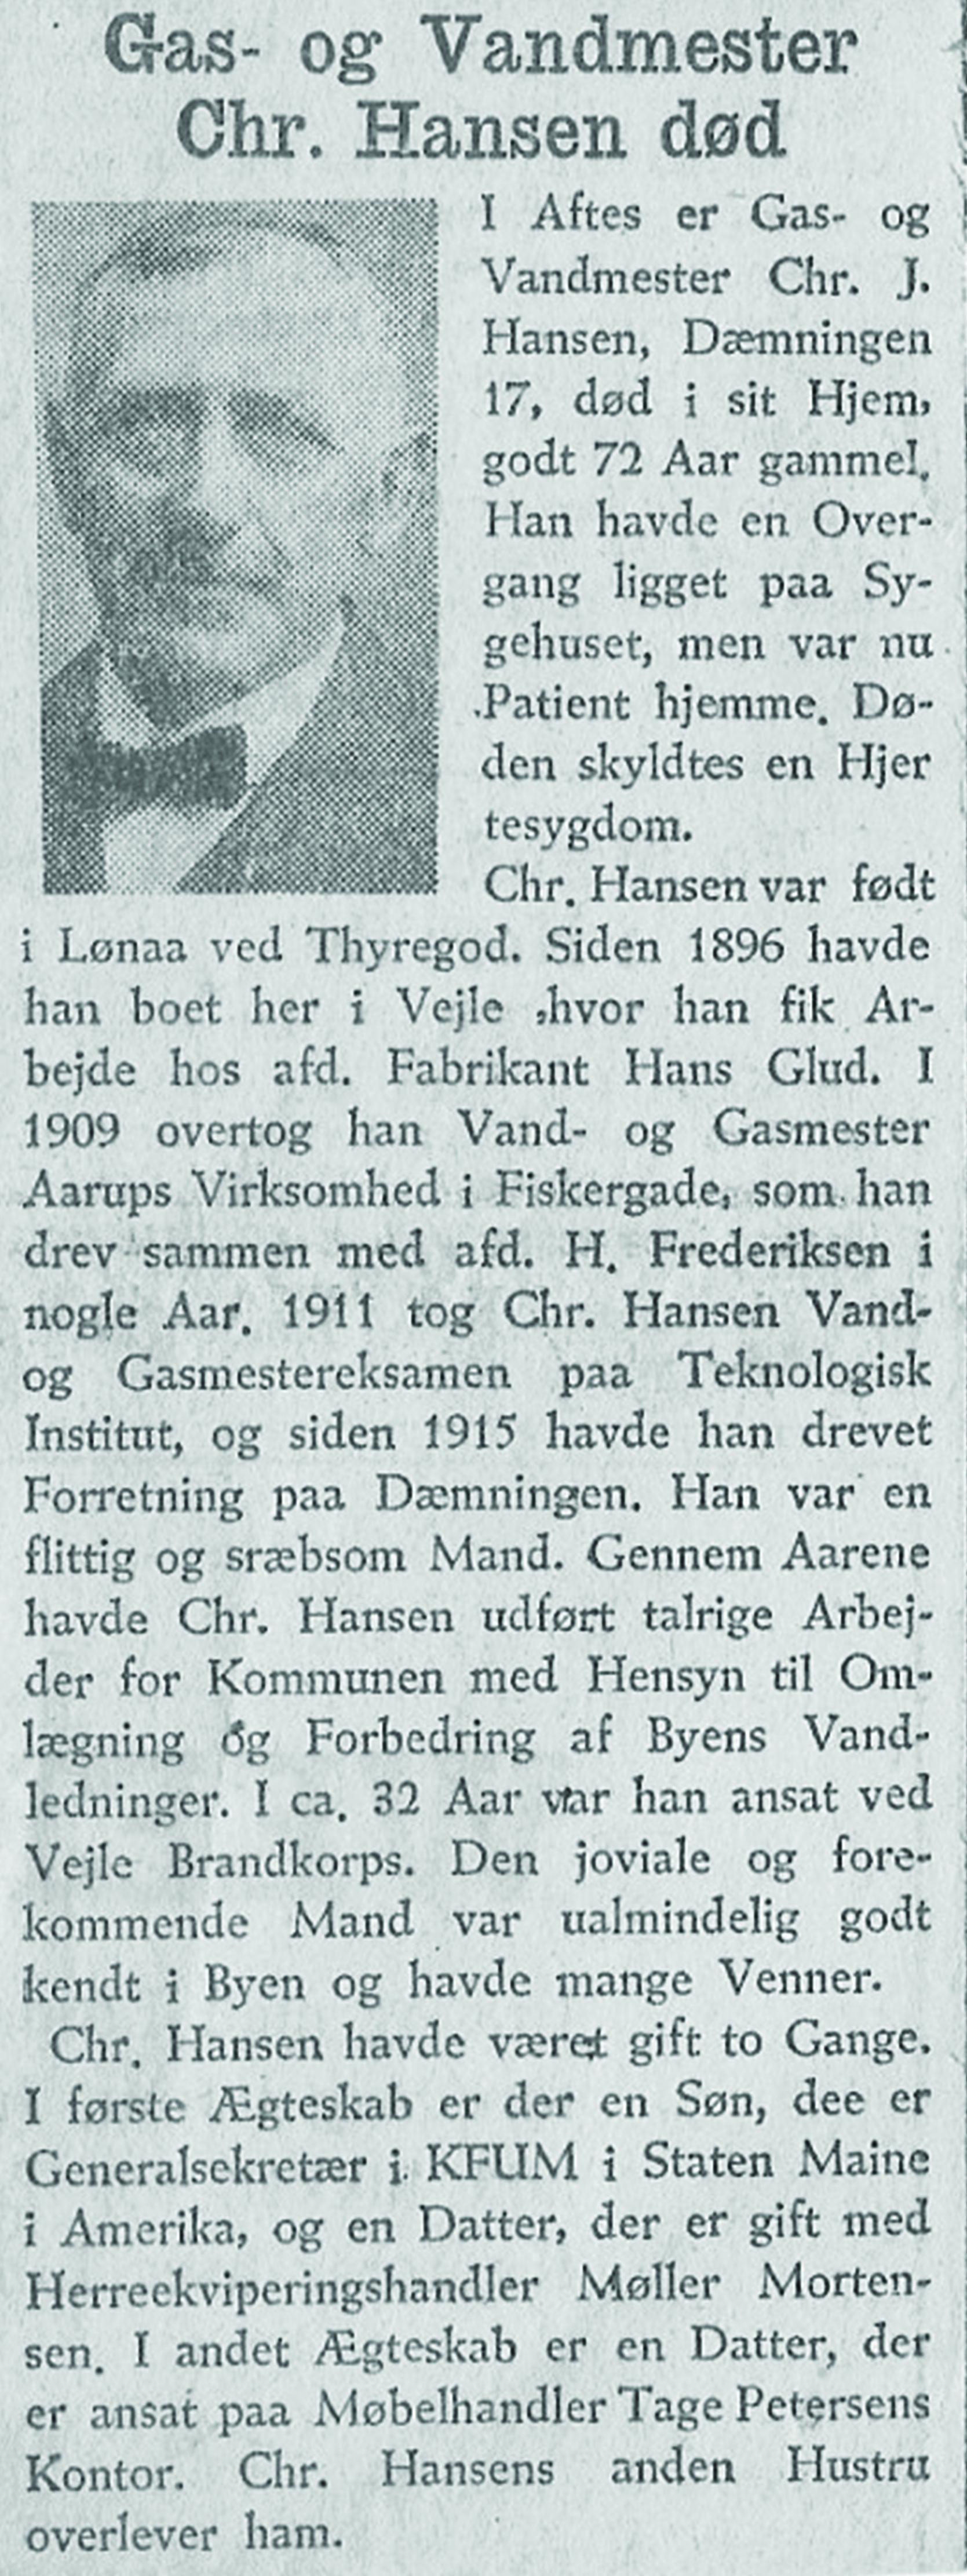 Dødsannonce d. 15. juni 1945 i Social-Demokraten, Vejle